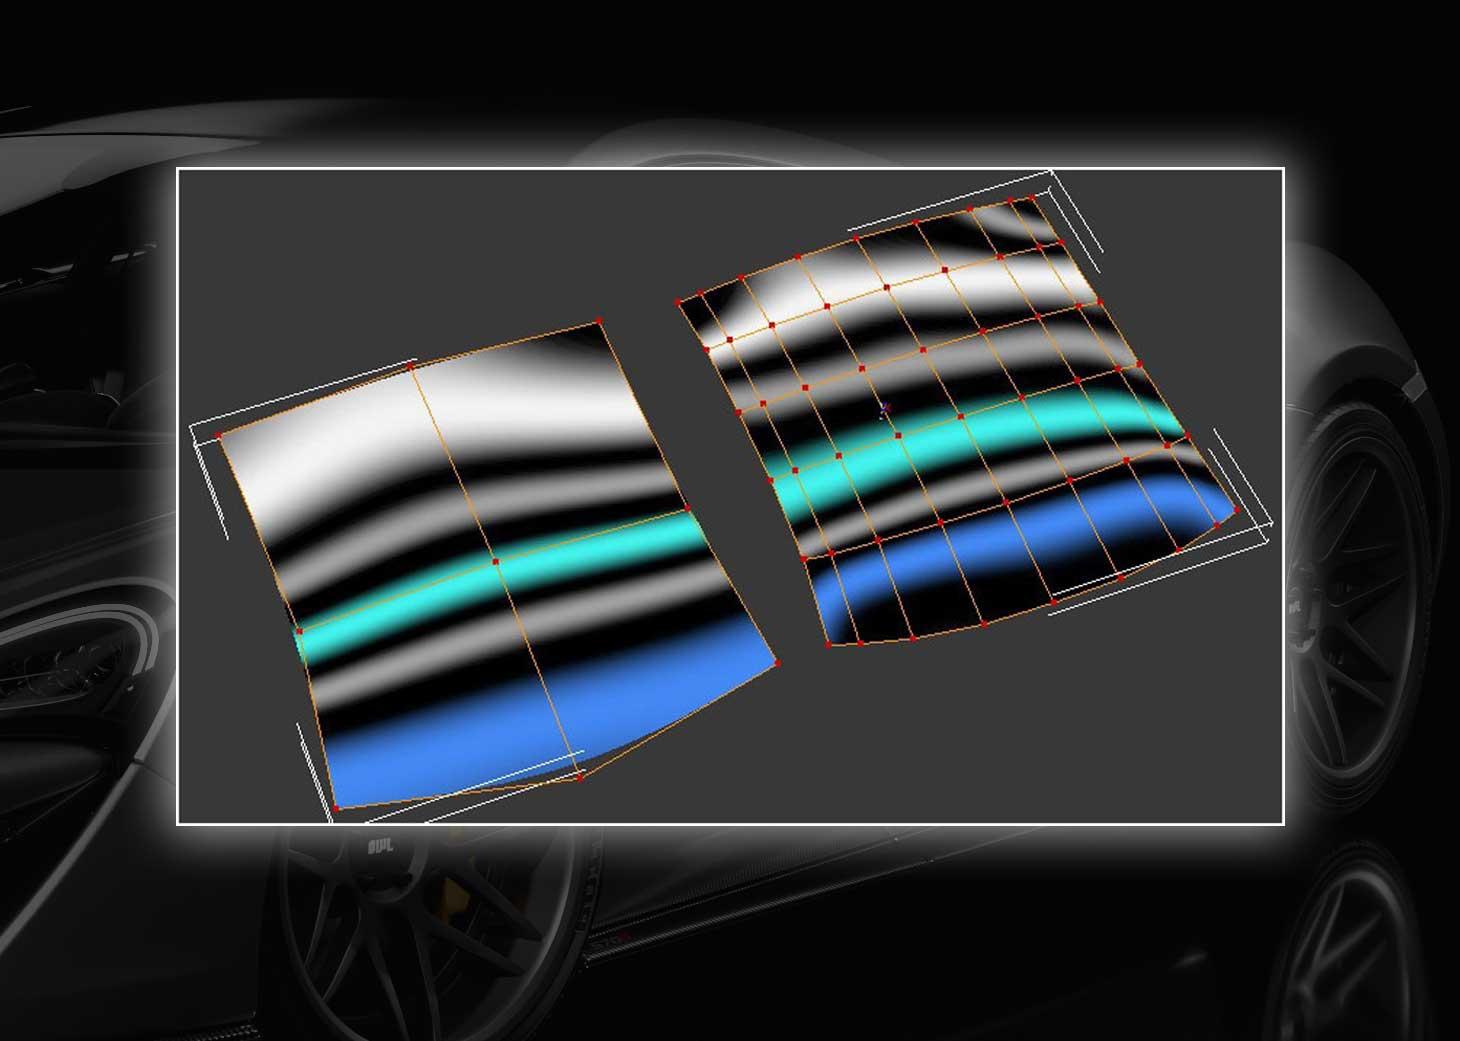 modeling using polygons car 3ds max maya14pg - مدلسازی خودرو در تری دی مکس